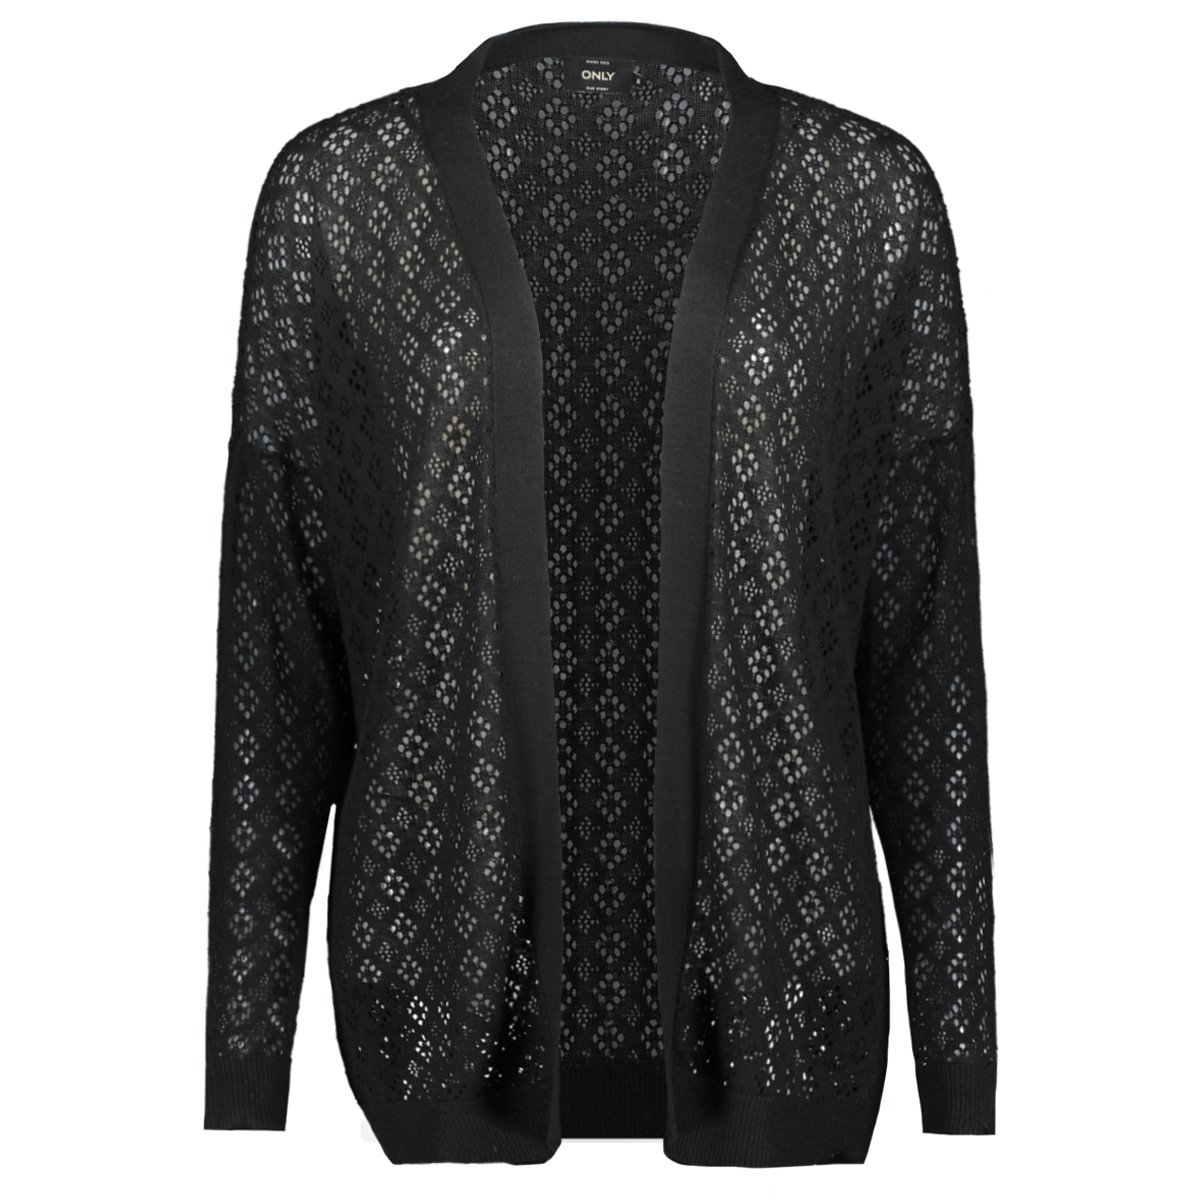 onlkylie l/s cardigan knt 15177603 only vest black